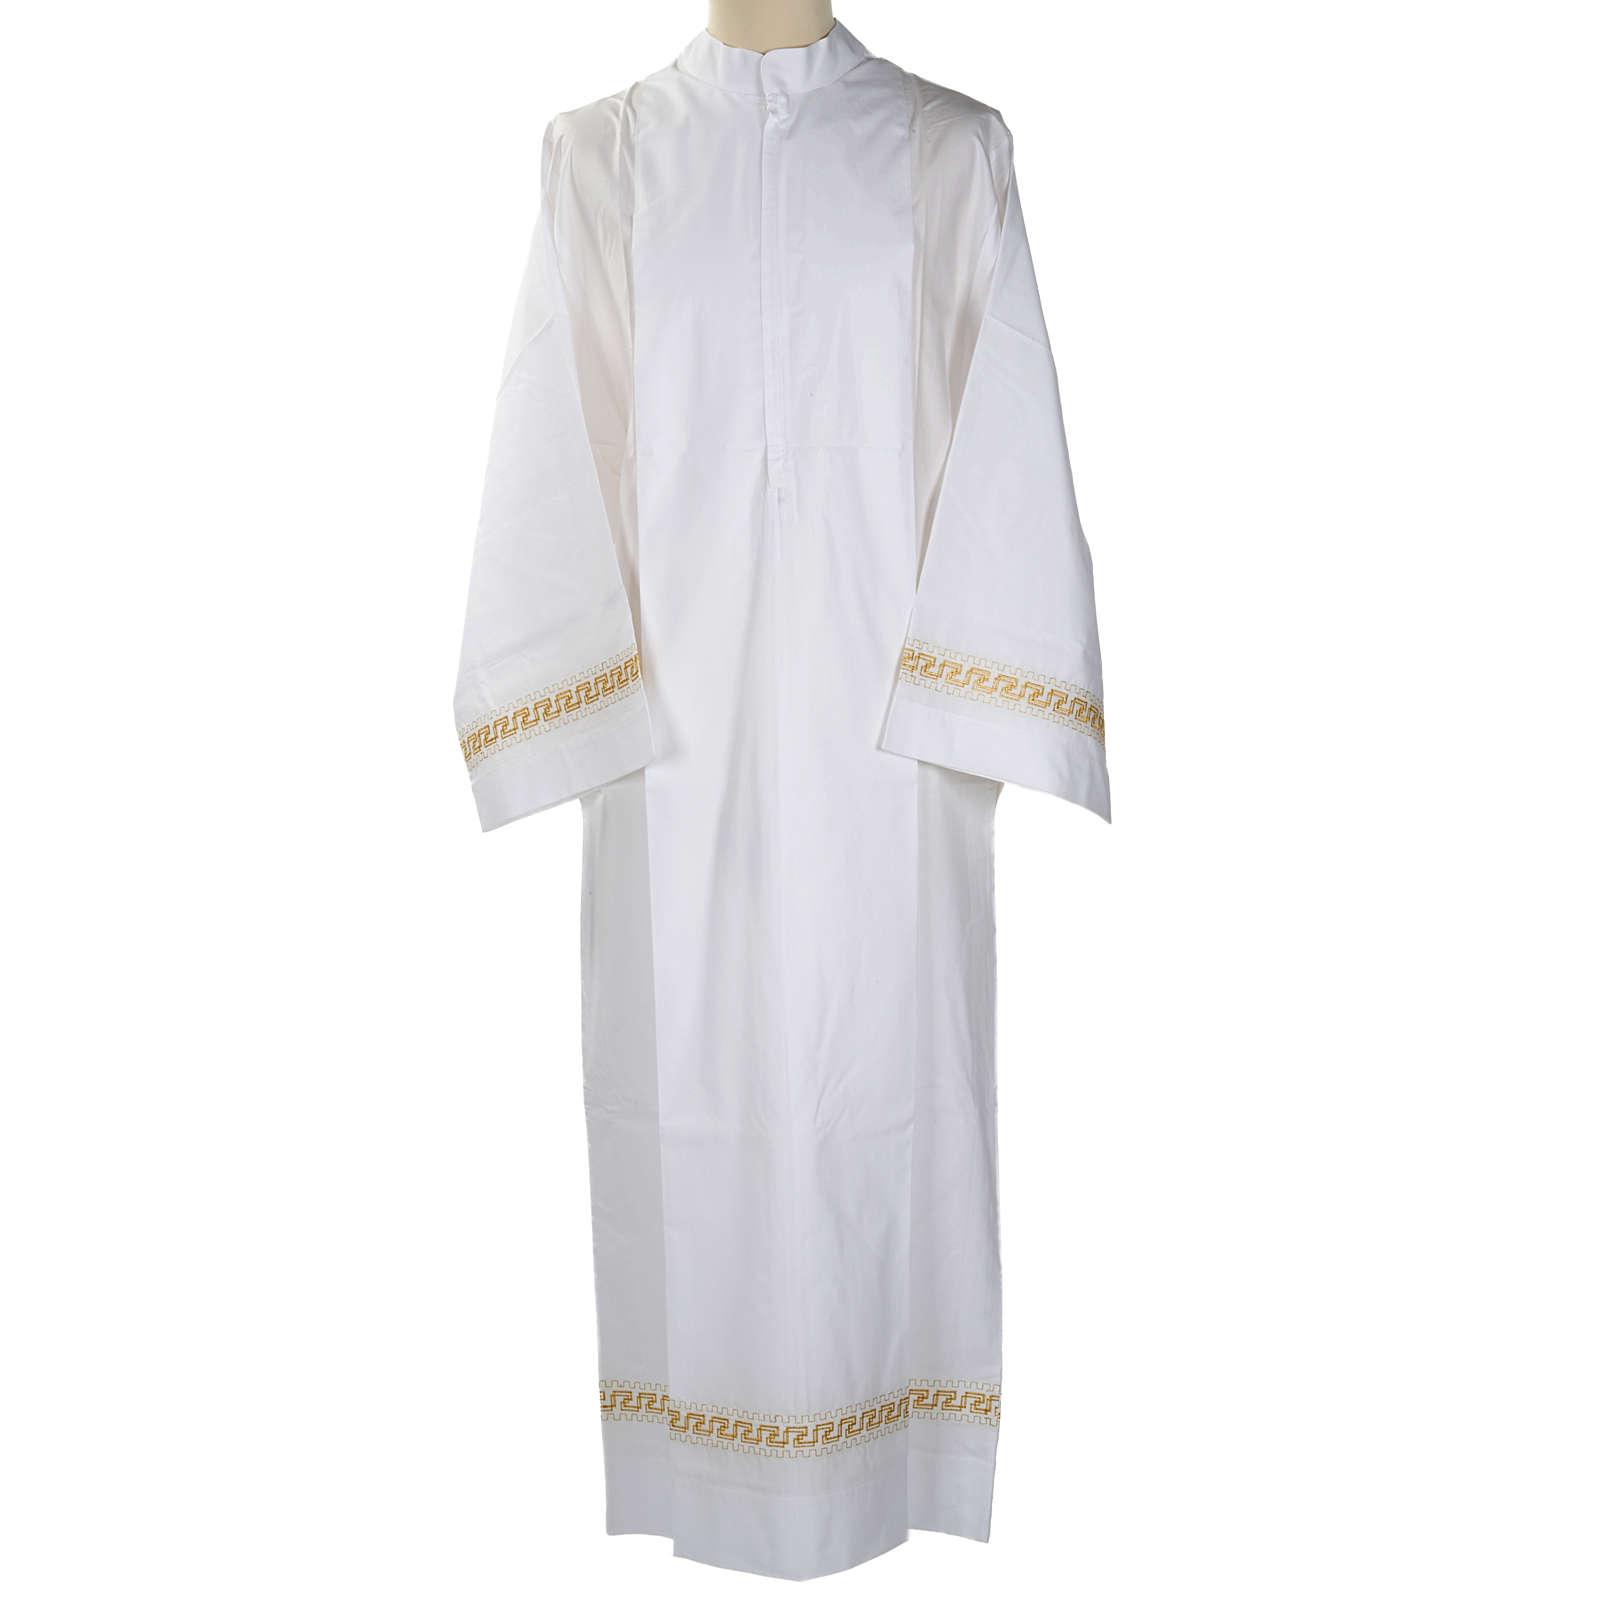 Camice bianco lana decori torciglioni dorati 4